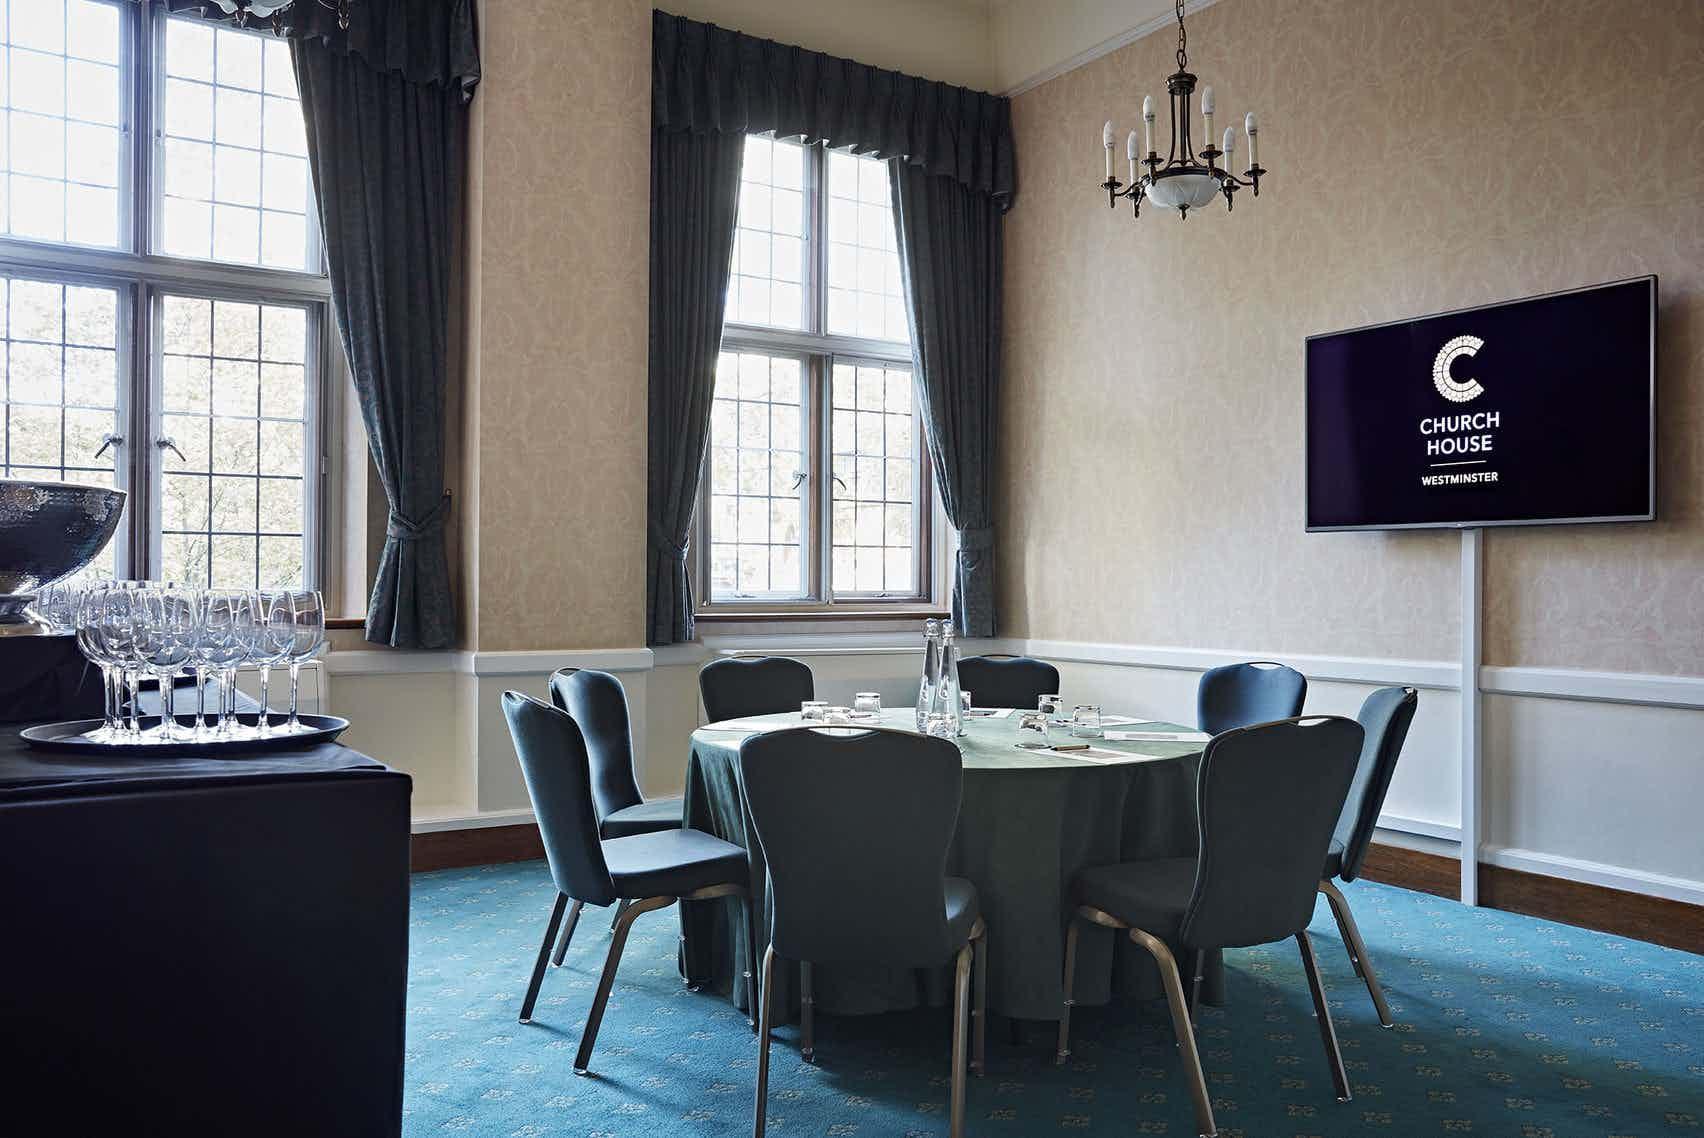 Jubilee Room, Church House Westminster